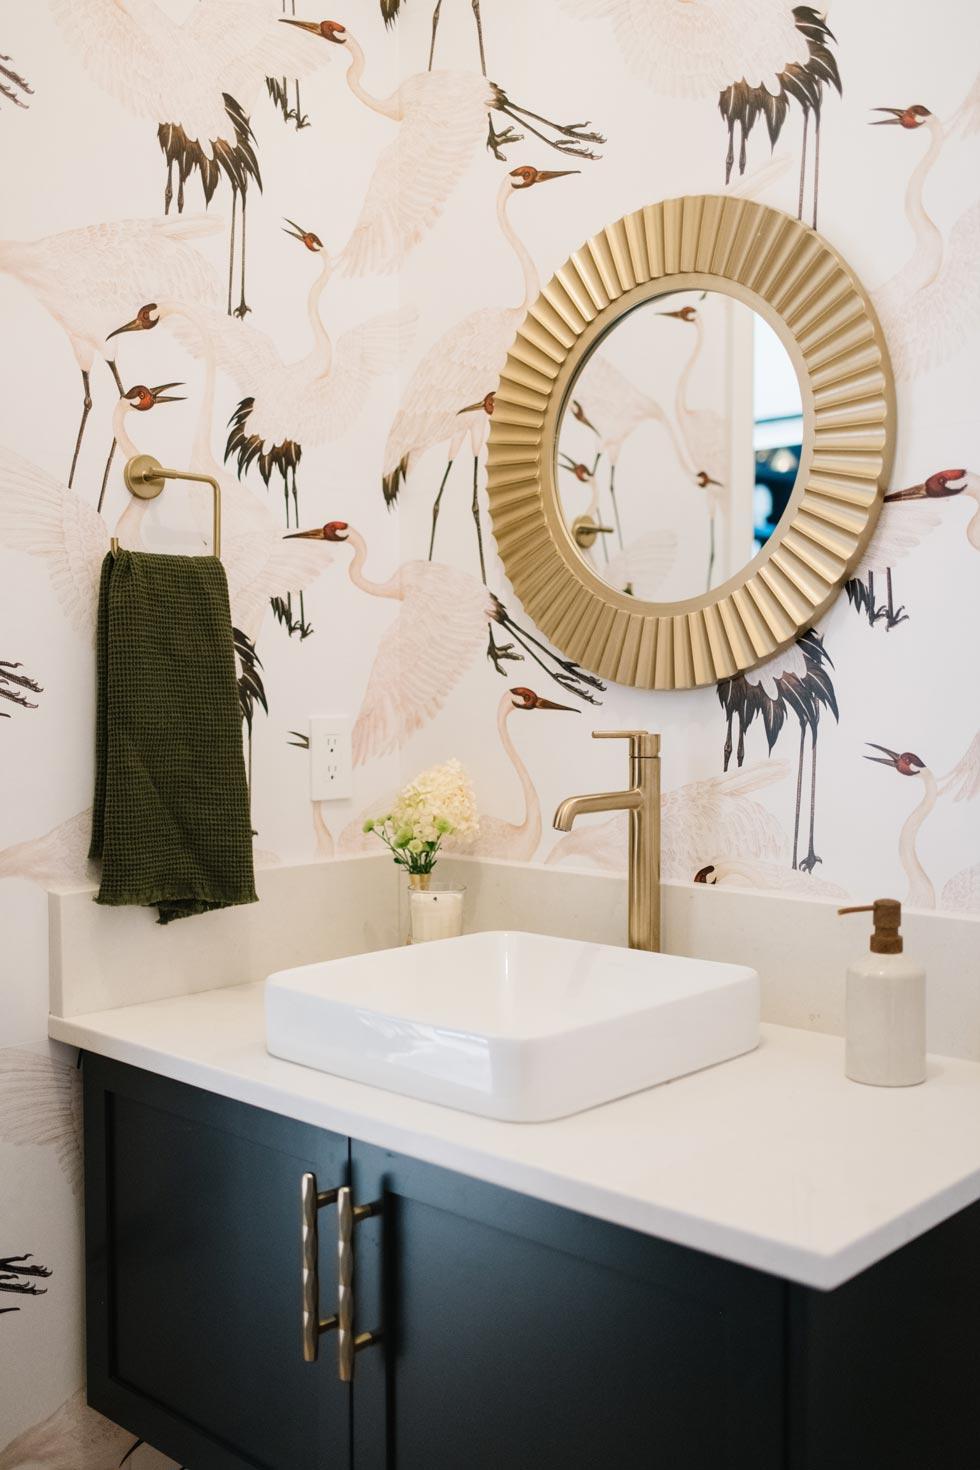 Wallpaper 1/2 bath Edmonton Based Designer Marissa Biggs